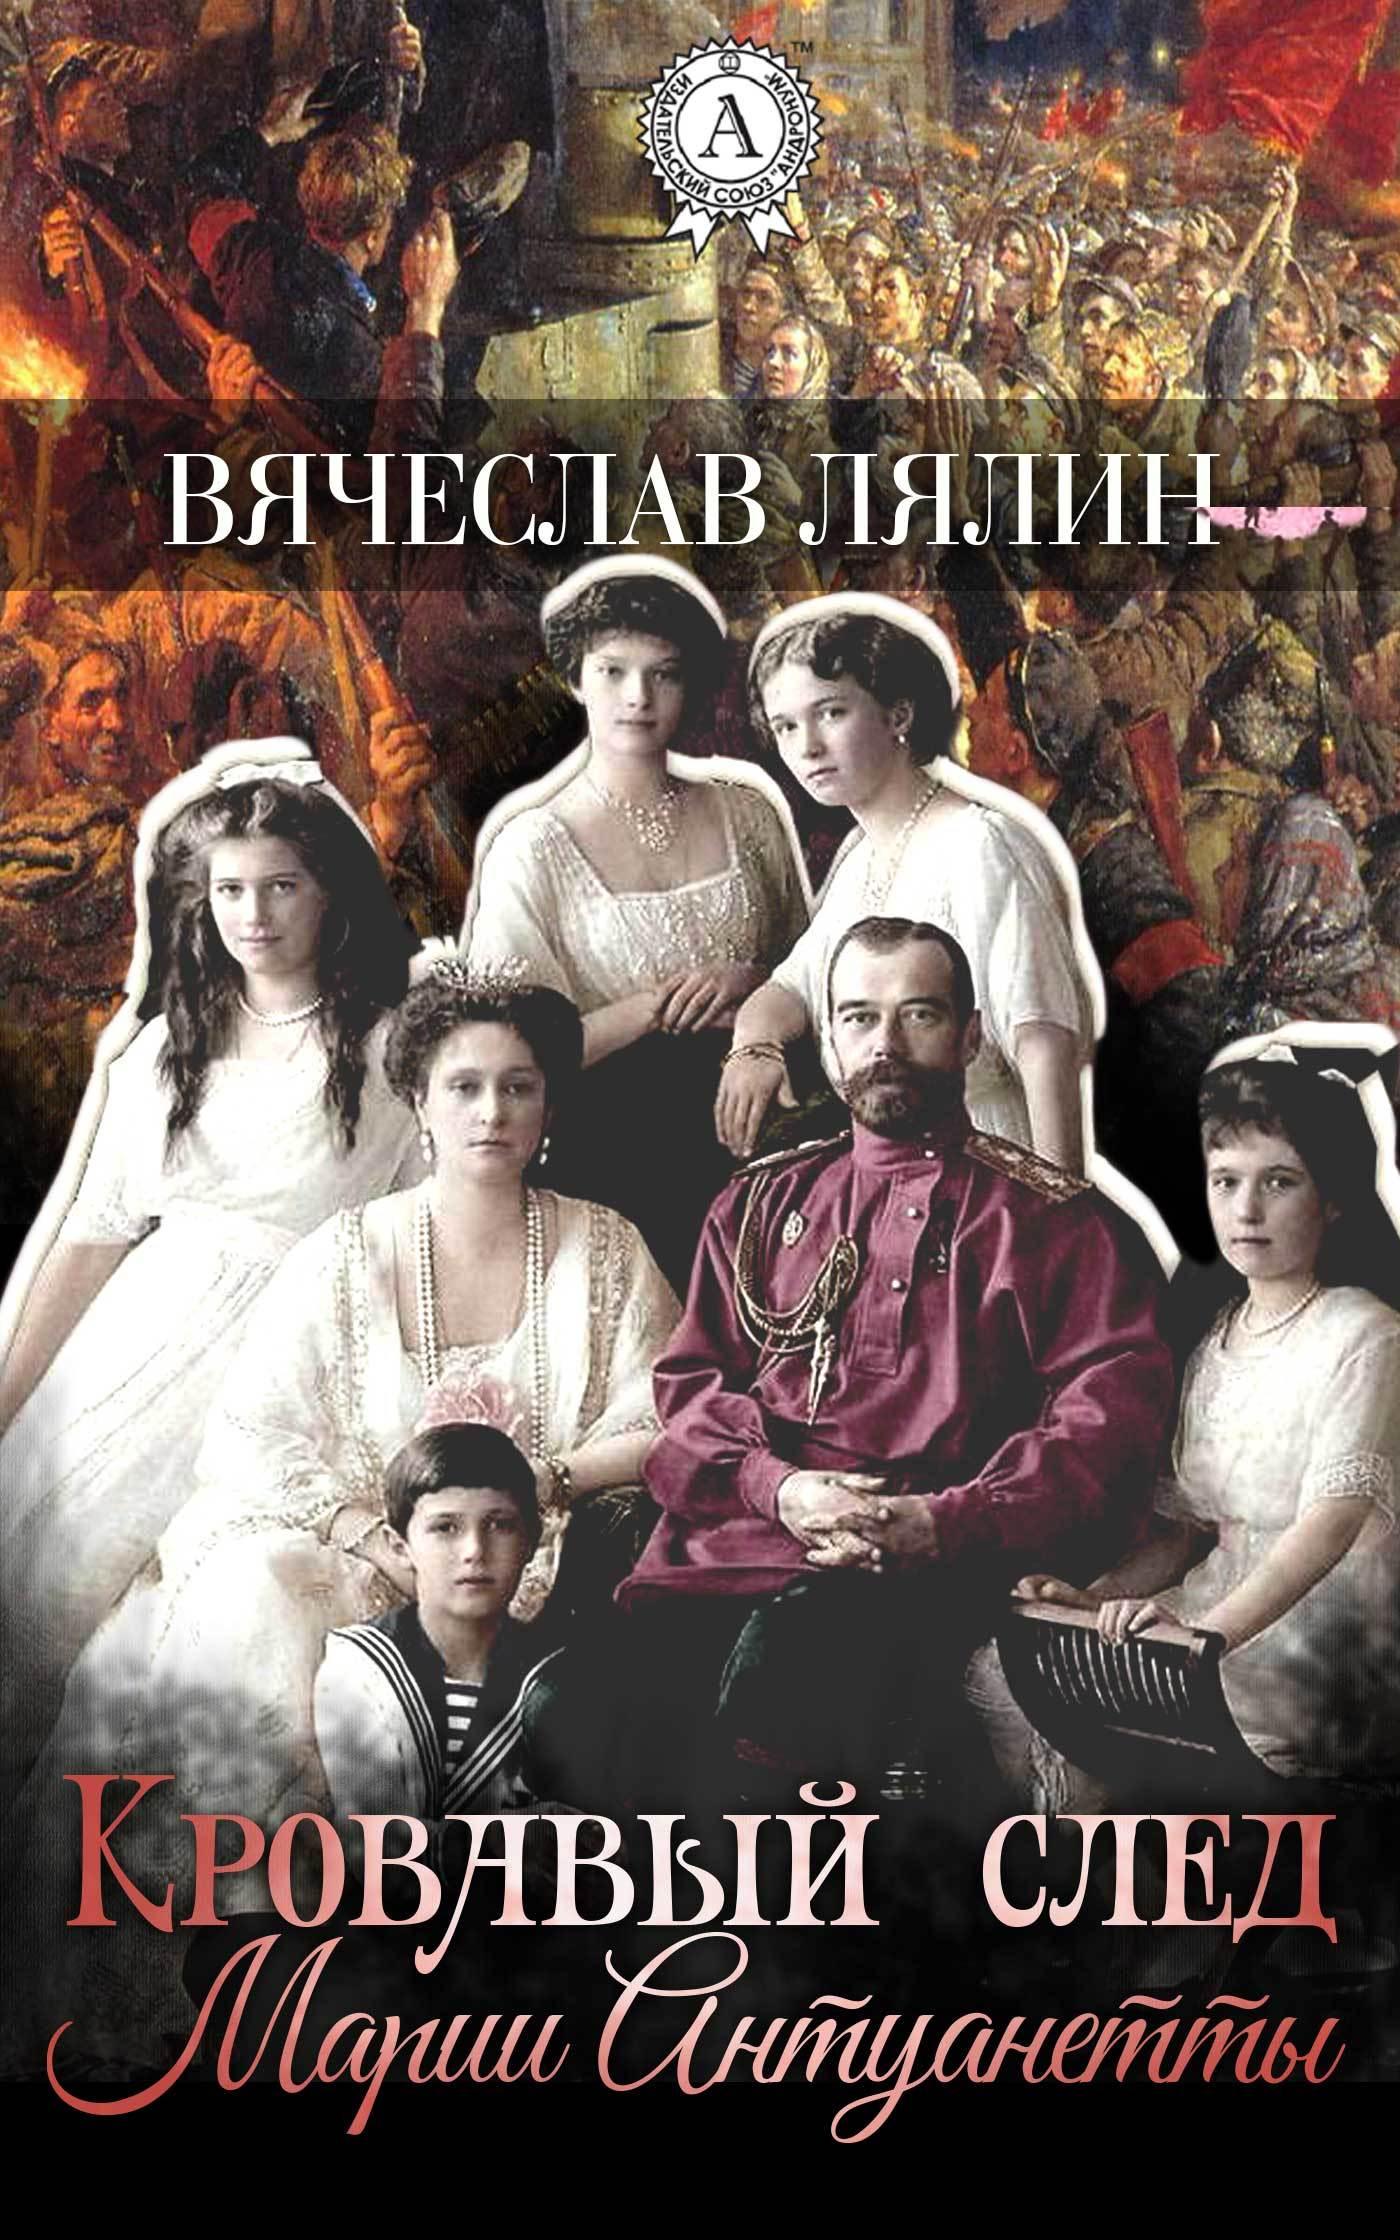 Вячеслав Лялин Кровавый след Марии-Антуанетты сокровища марии антуанетты